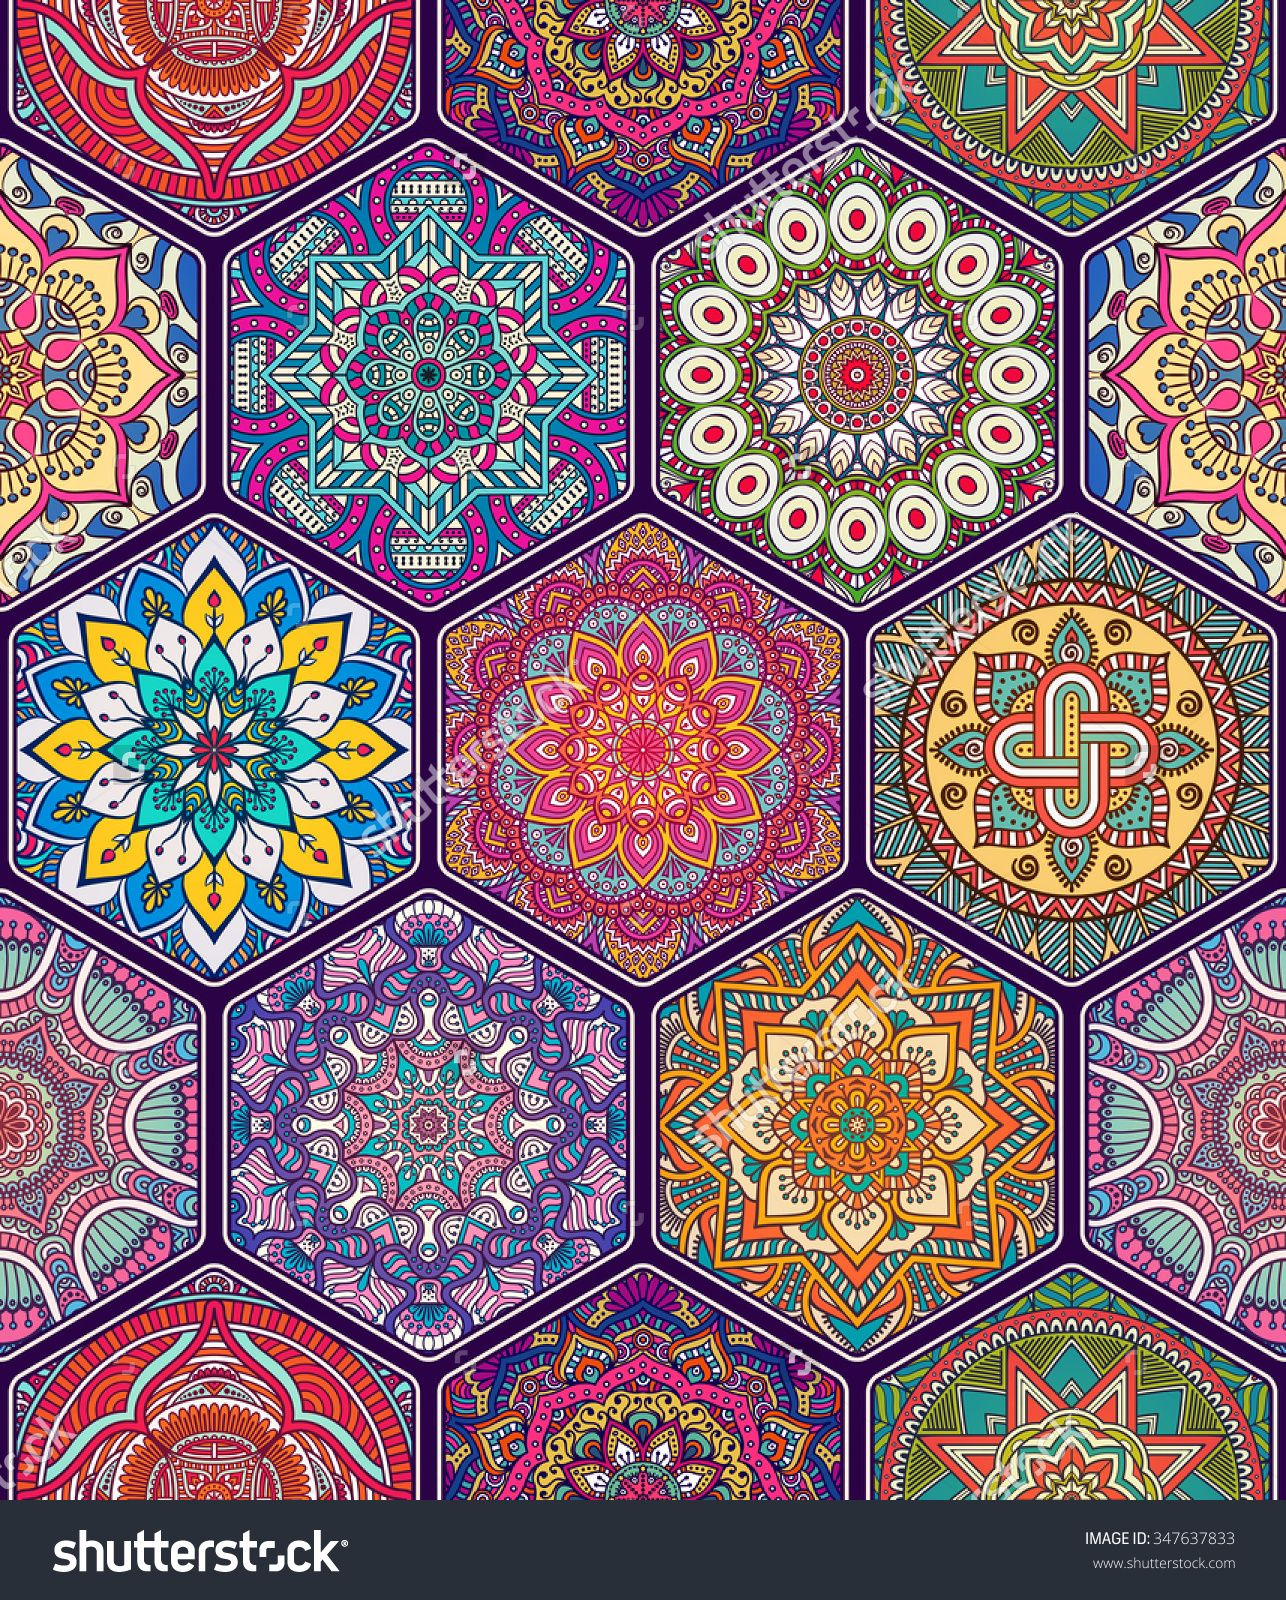 Seamless Pattern Vintage Decorative Elements Hand Drawn